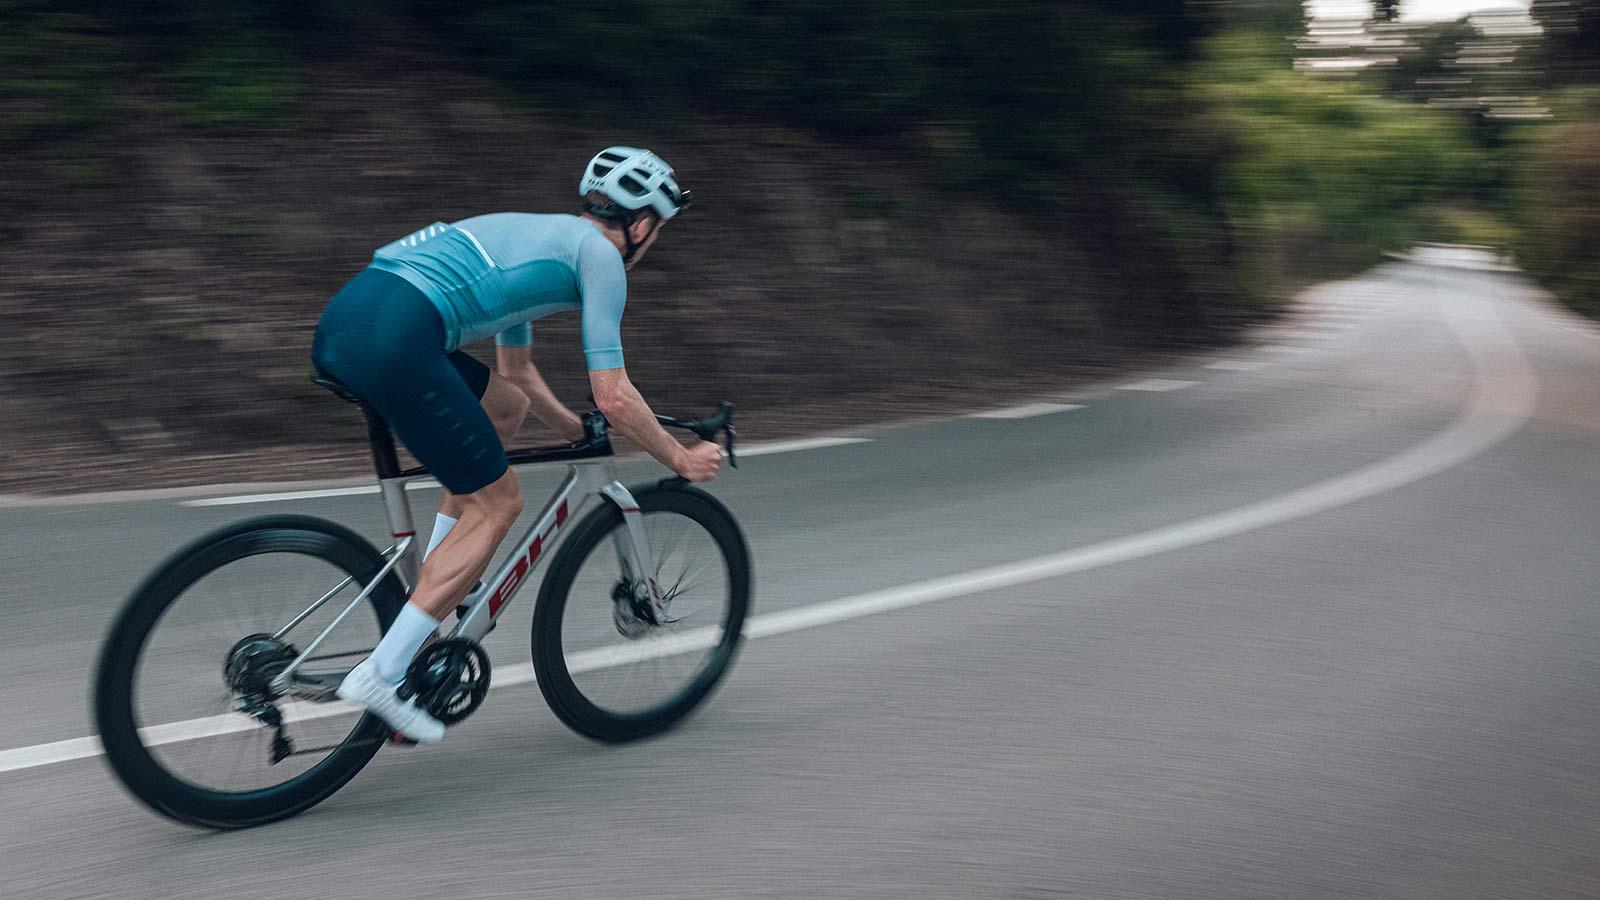 2022 BH Aerolight lightweight aero carbon all-rounder road bike,riding